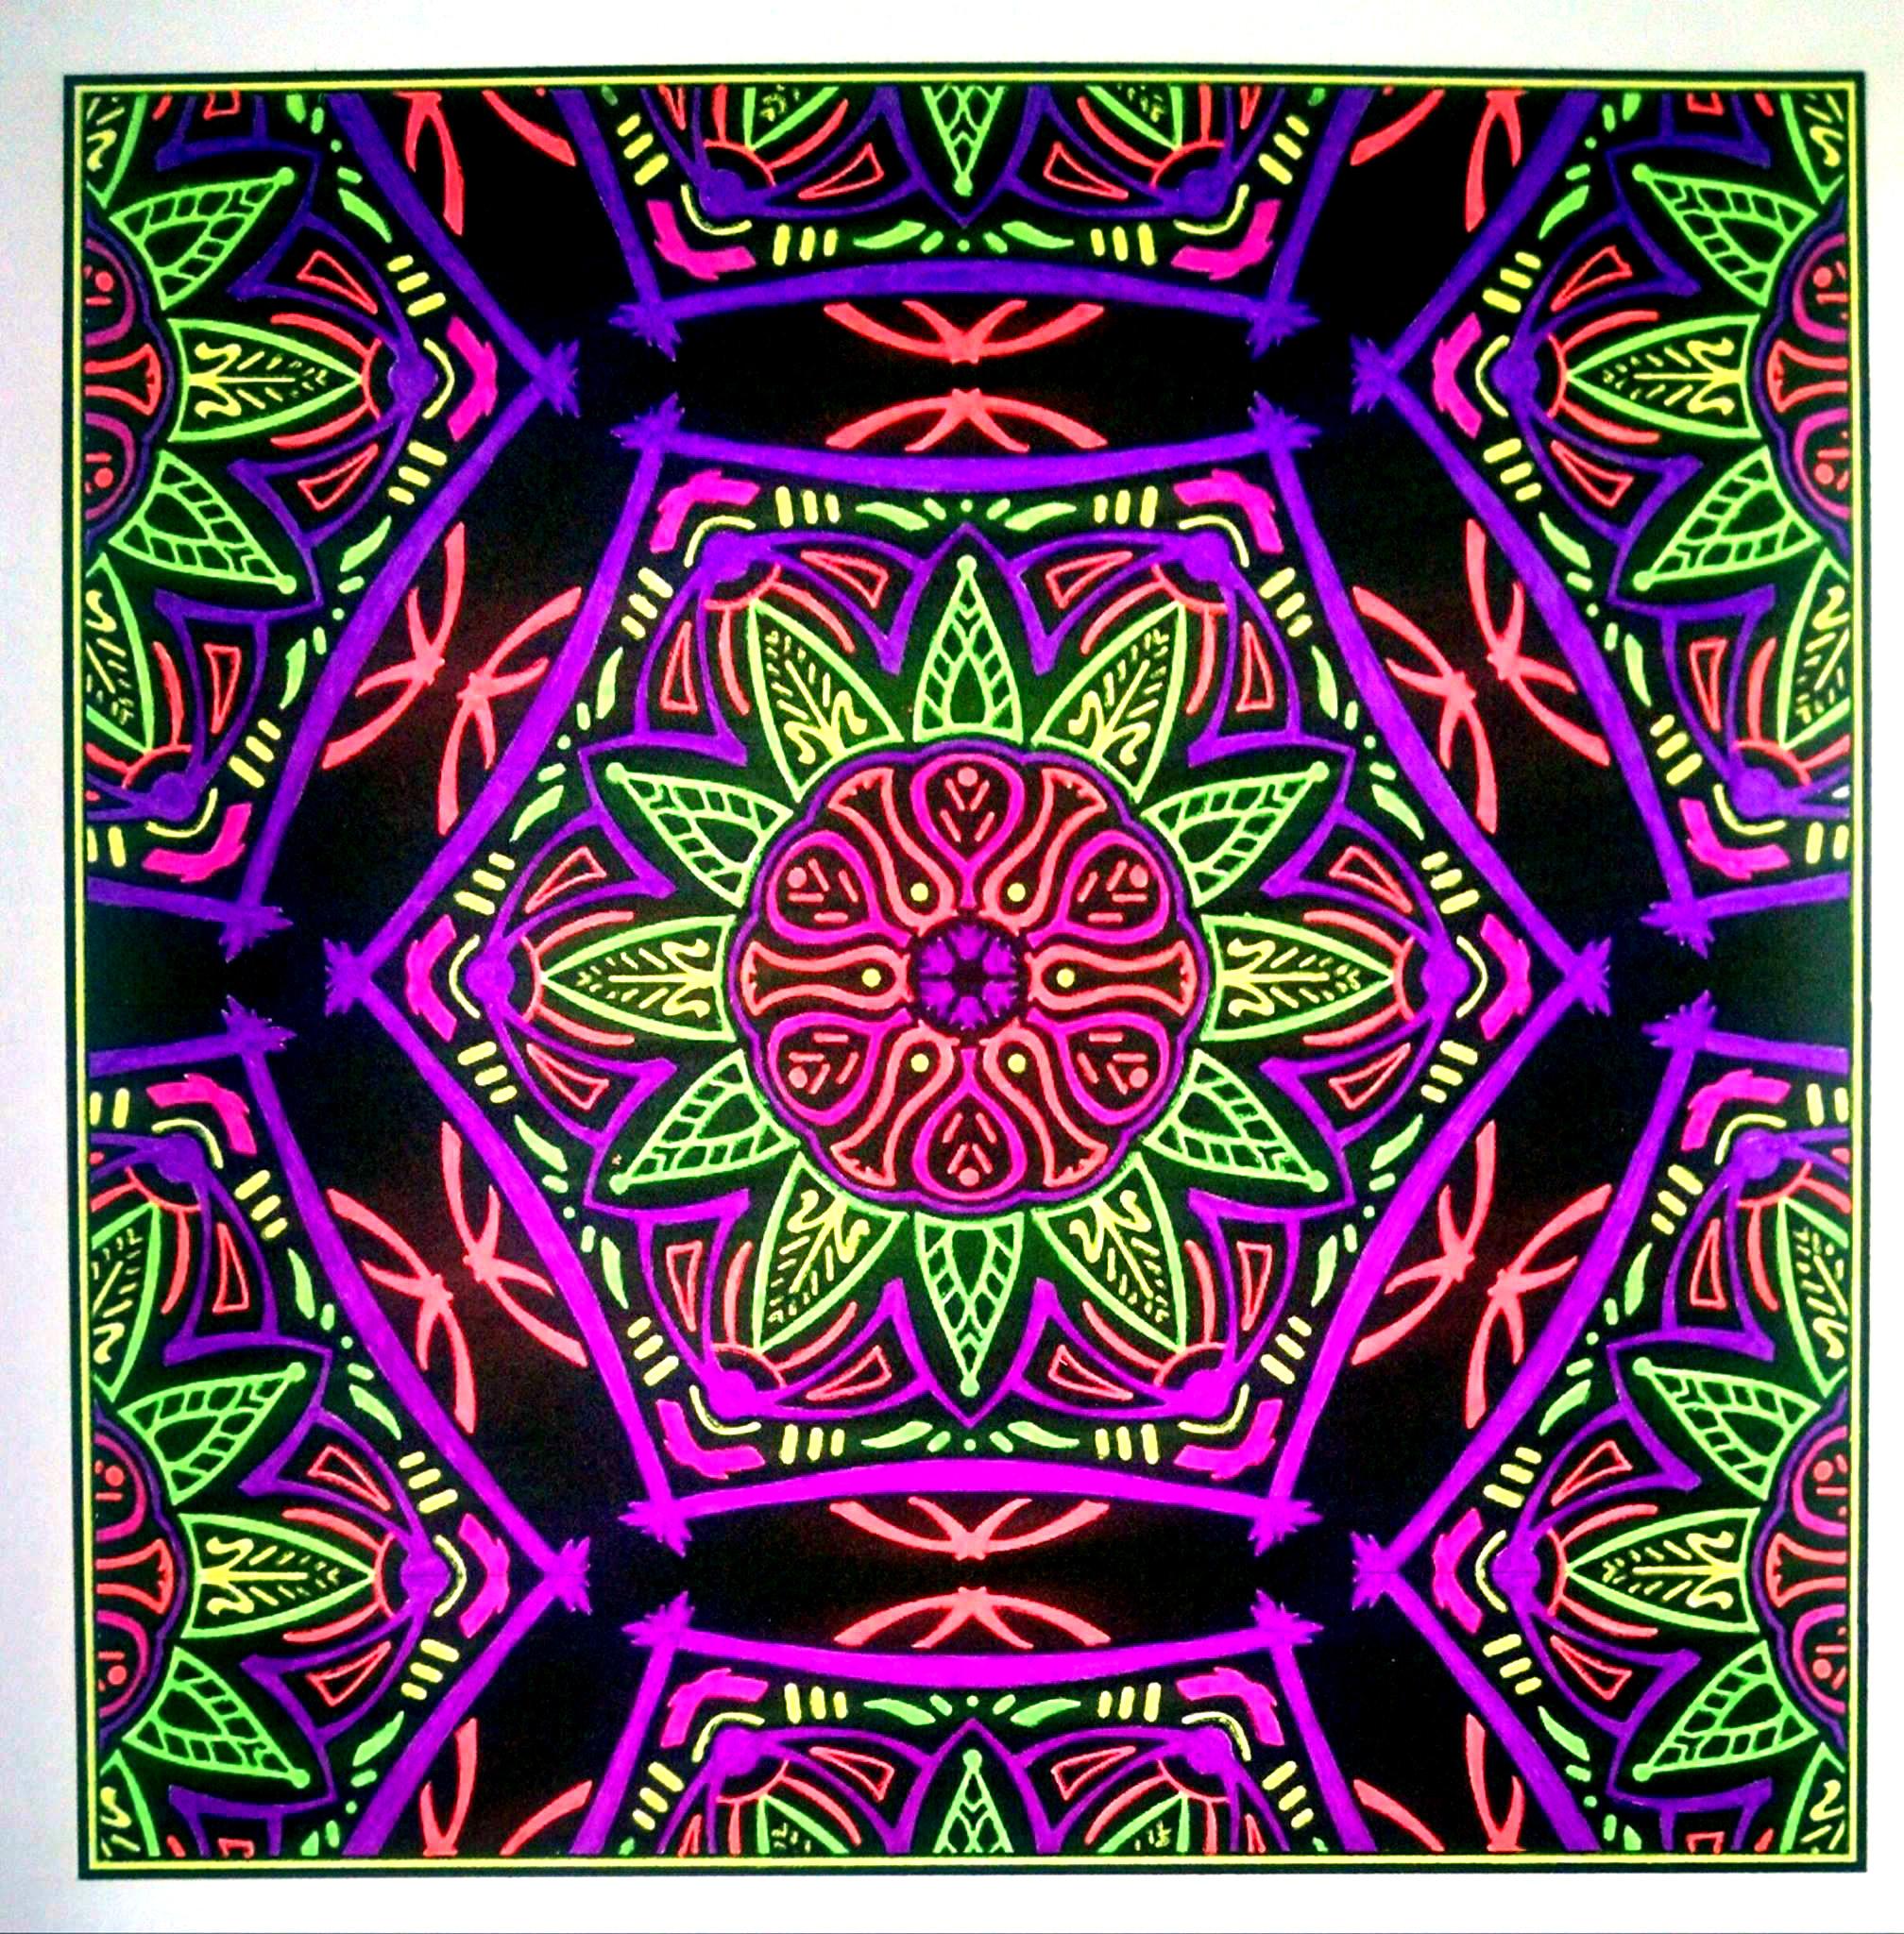 """Rotunda"" OrnaMENTALs Design #0052, colored by Jennifer Beaulieu"